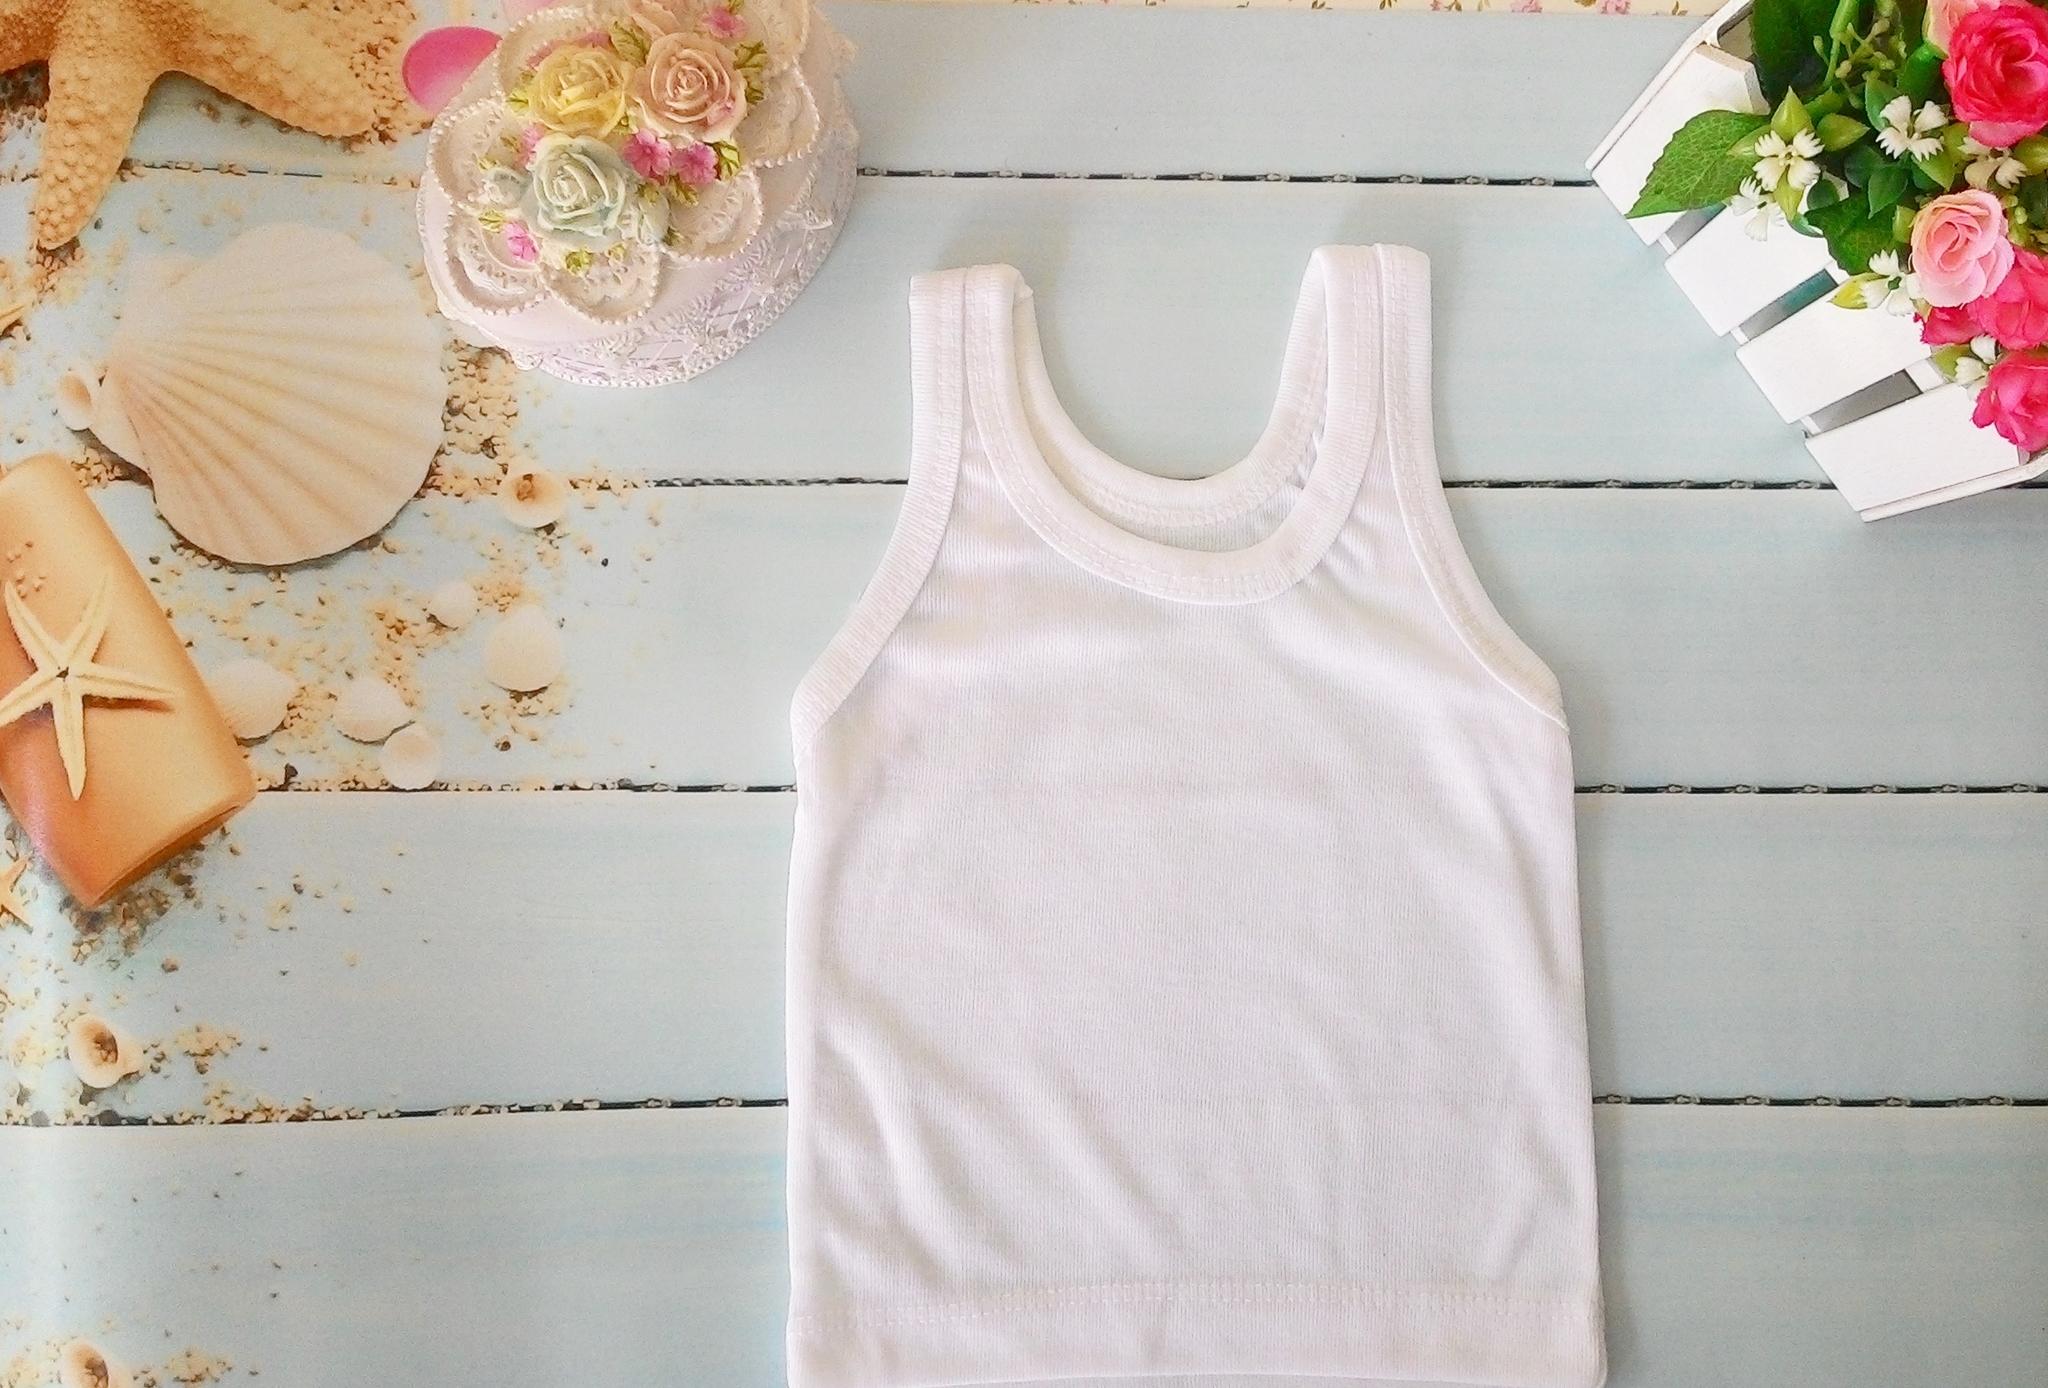 Jual Kaos Dalam Bayi Umur 6 Bulan Blanja Com